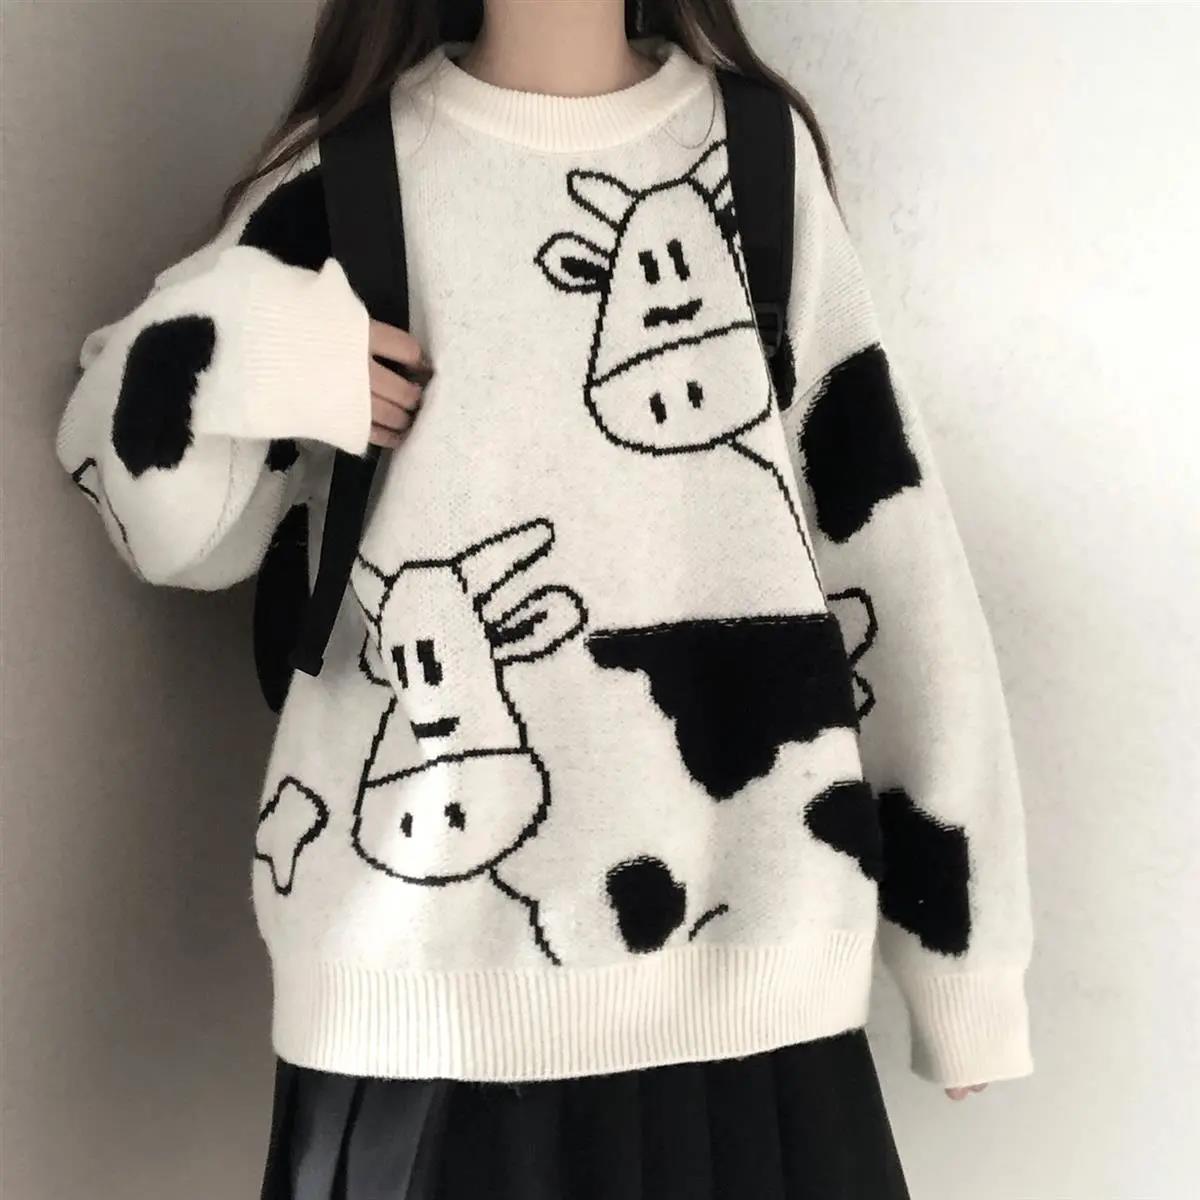 Egirl Harajuku pullover with a cow print 45